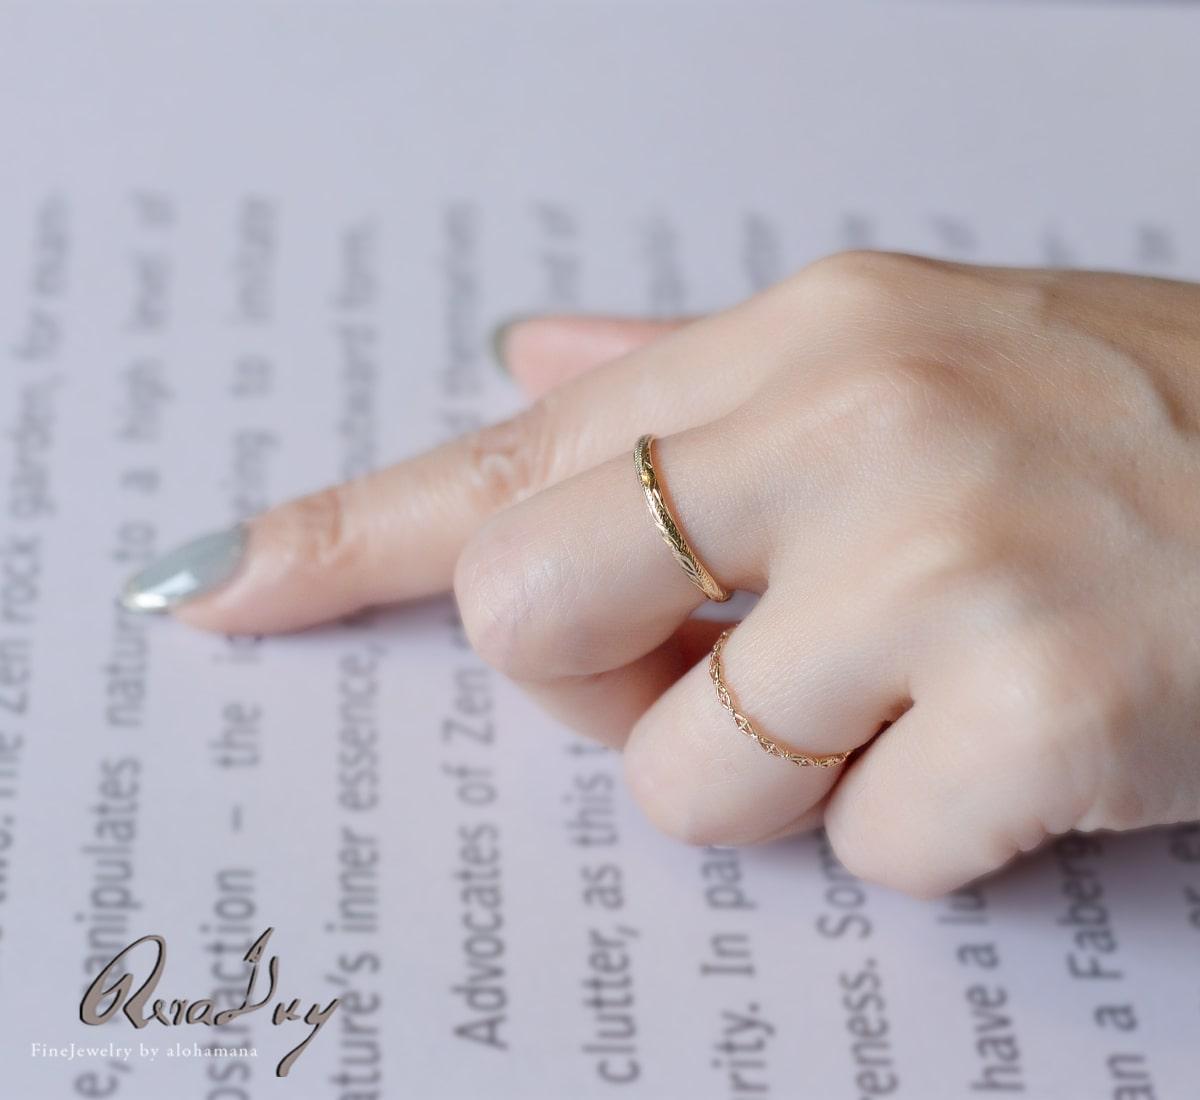 K10 リング 指輪 透かしクロスゴールドリング  (RERALUy) 華奢 新作/rri1678k10